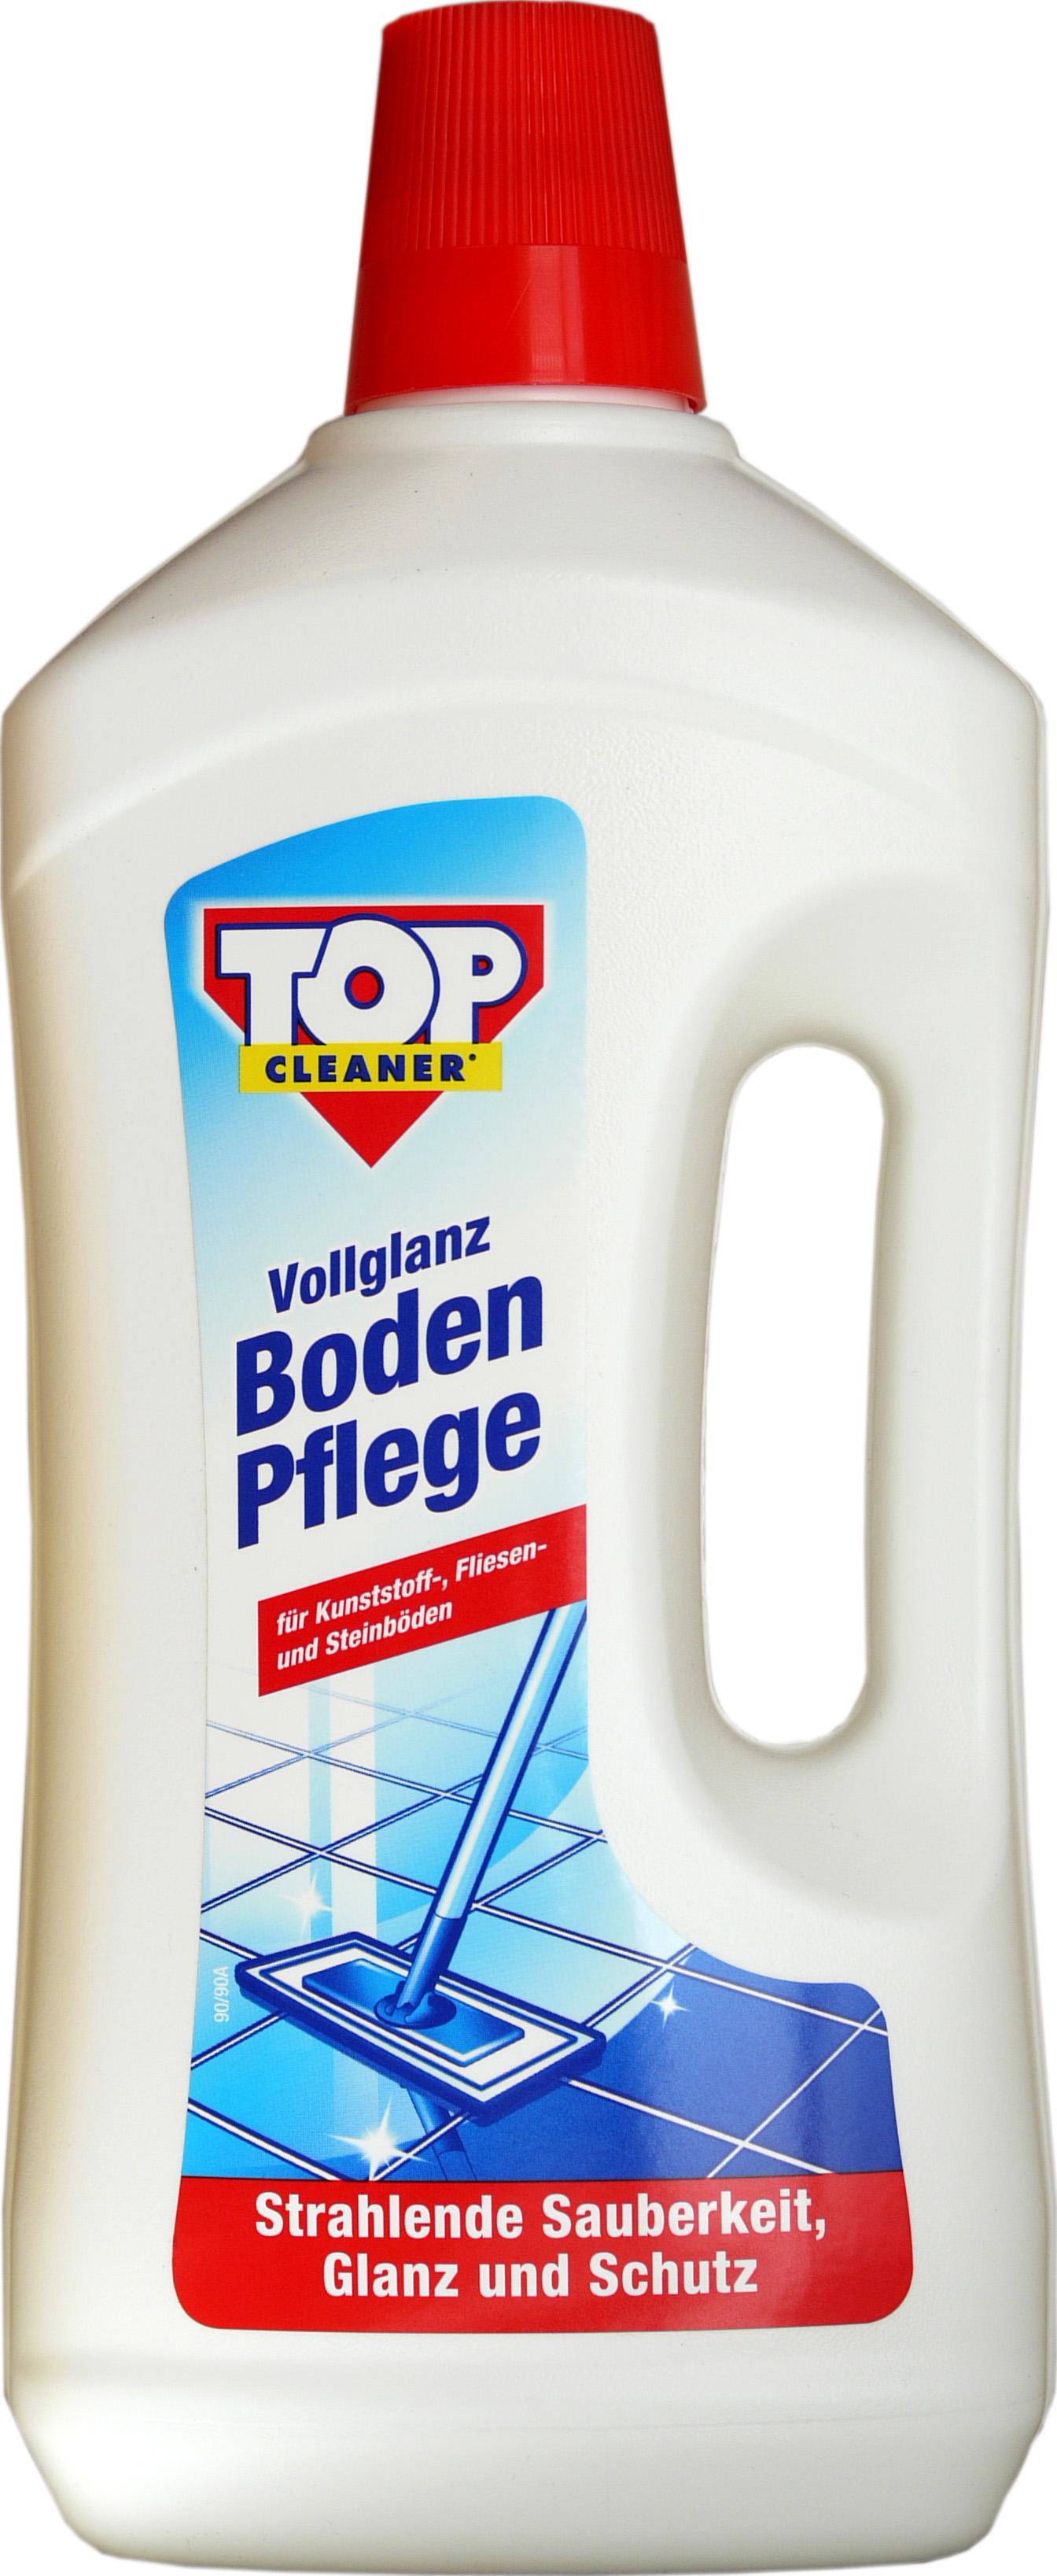 00608 - TopCleaner Vollglanz Bodenpflege 1000 ml